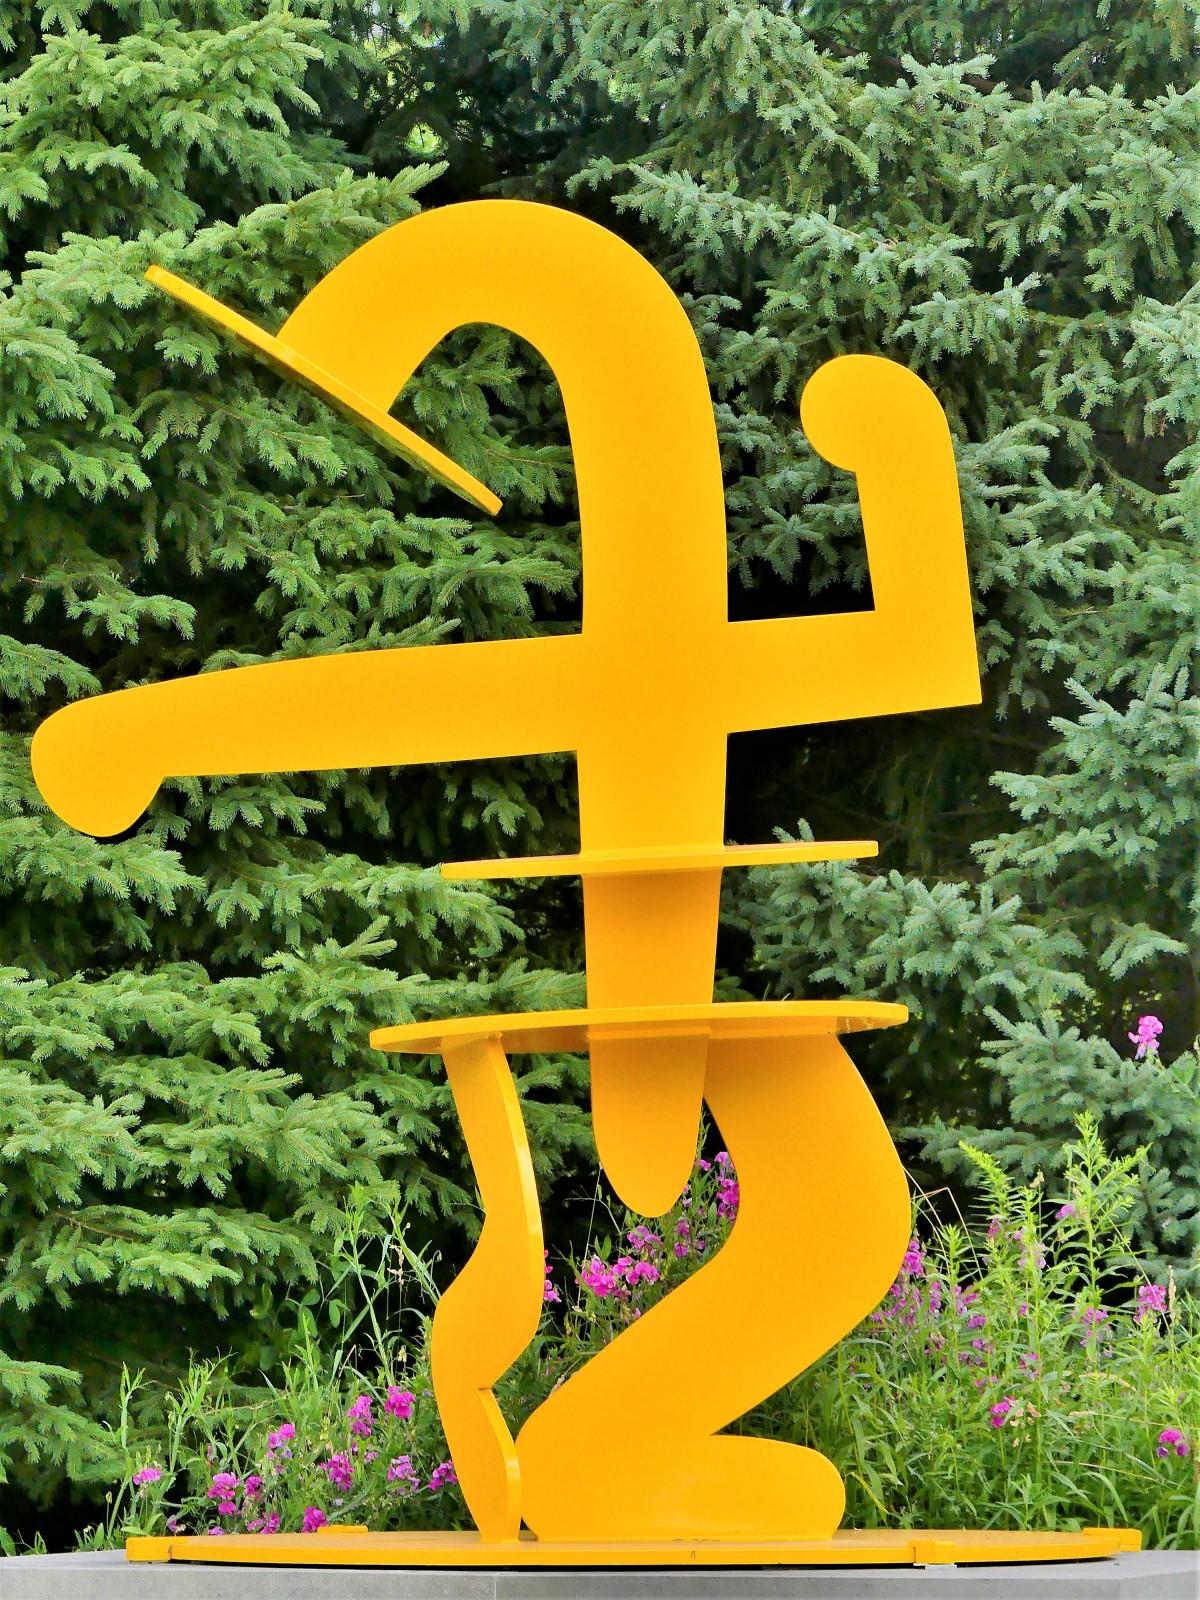 Keith Haring's Julia